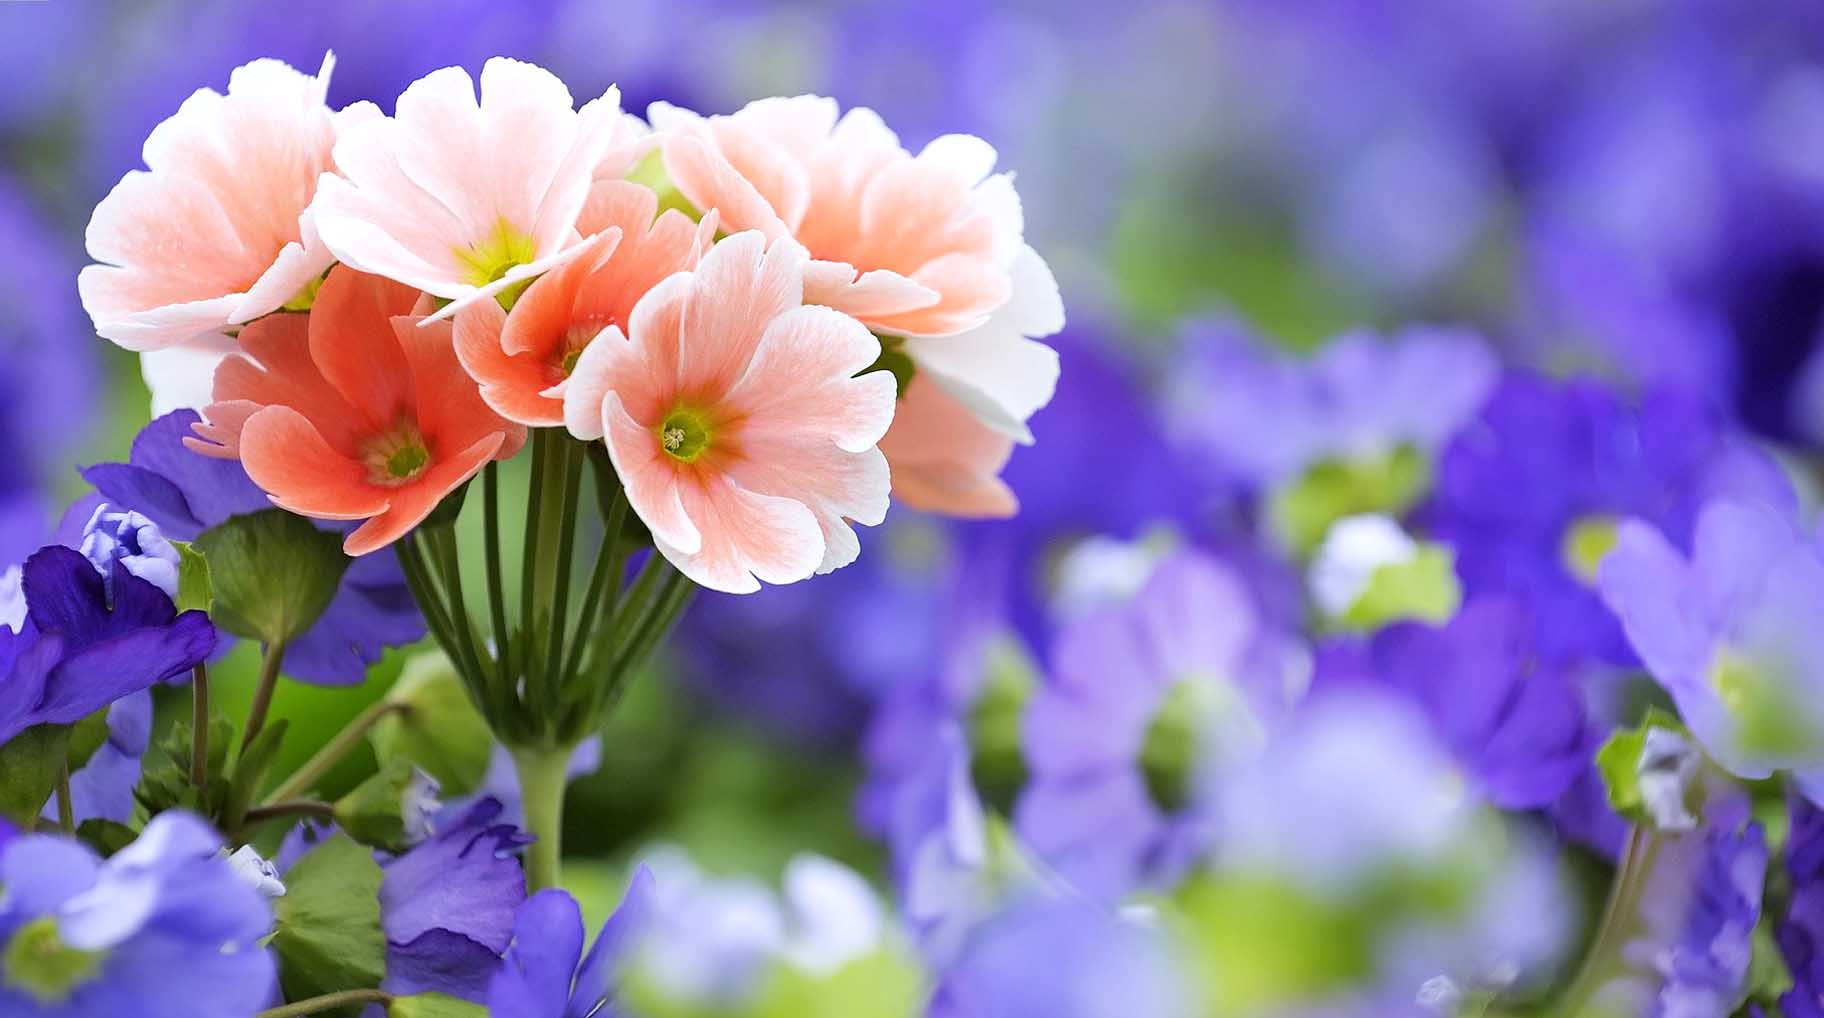 download of flowers wallpapers for desktop 1824x1018